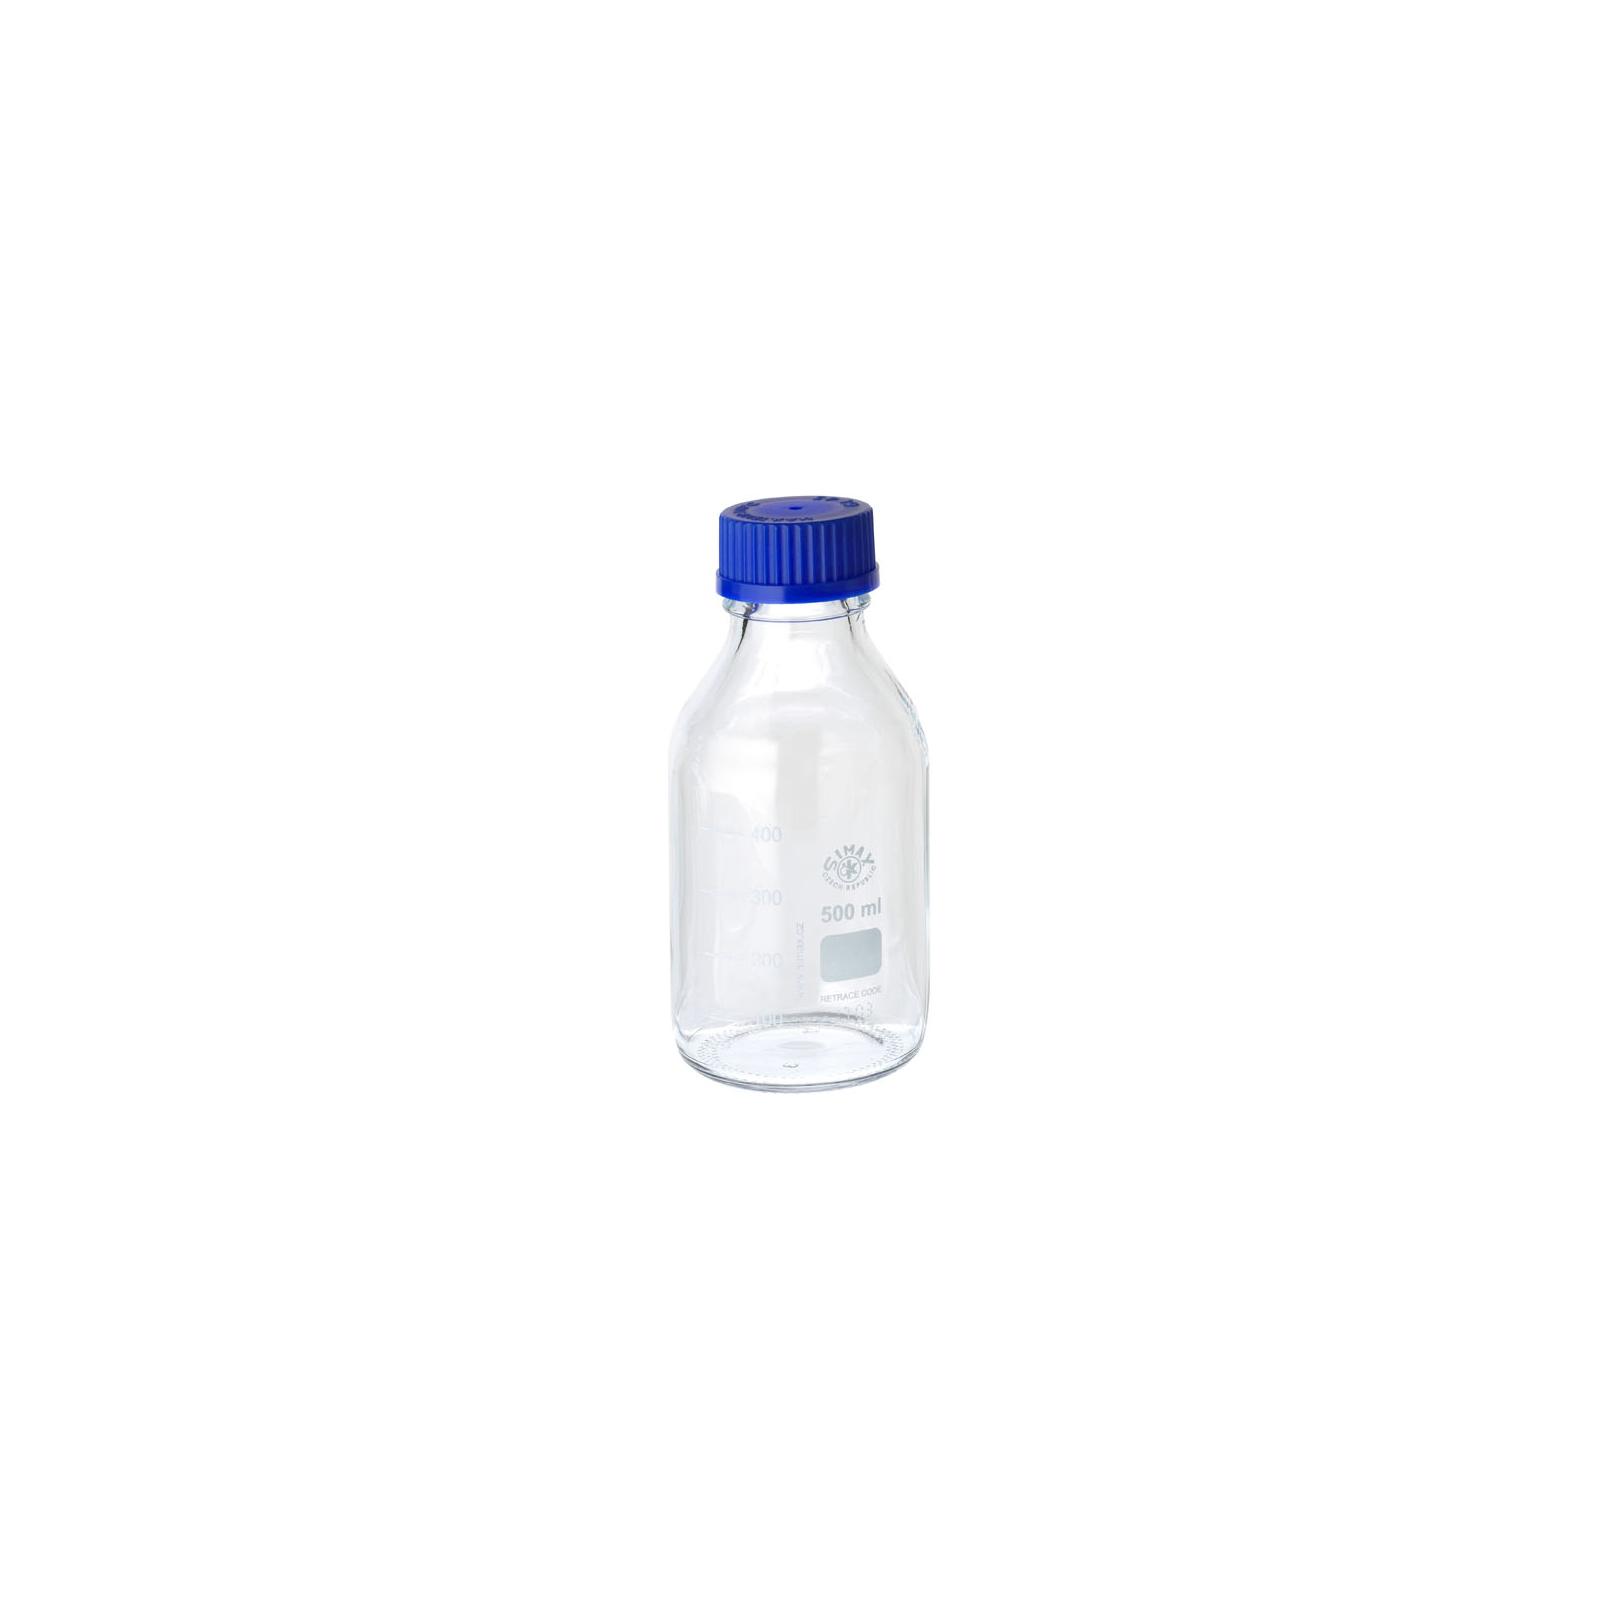 Bottle, laboratory, 500 ml, clear, with blue screwcap GL 45